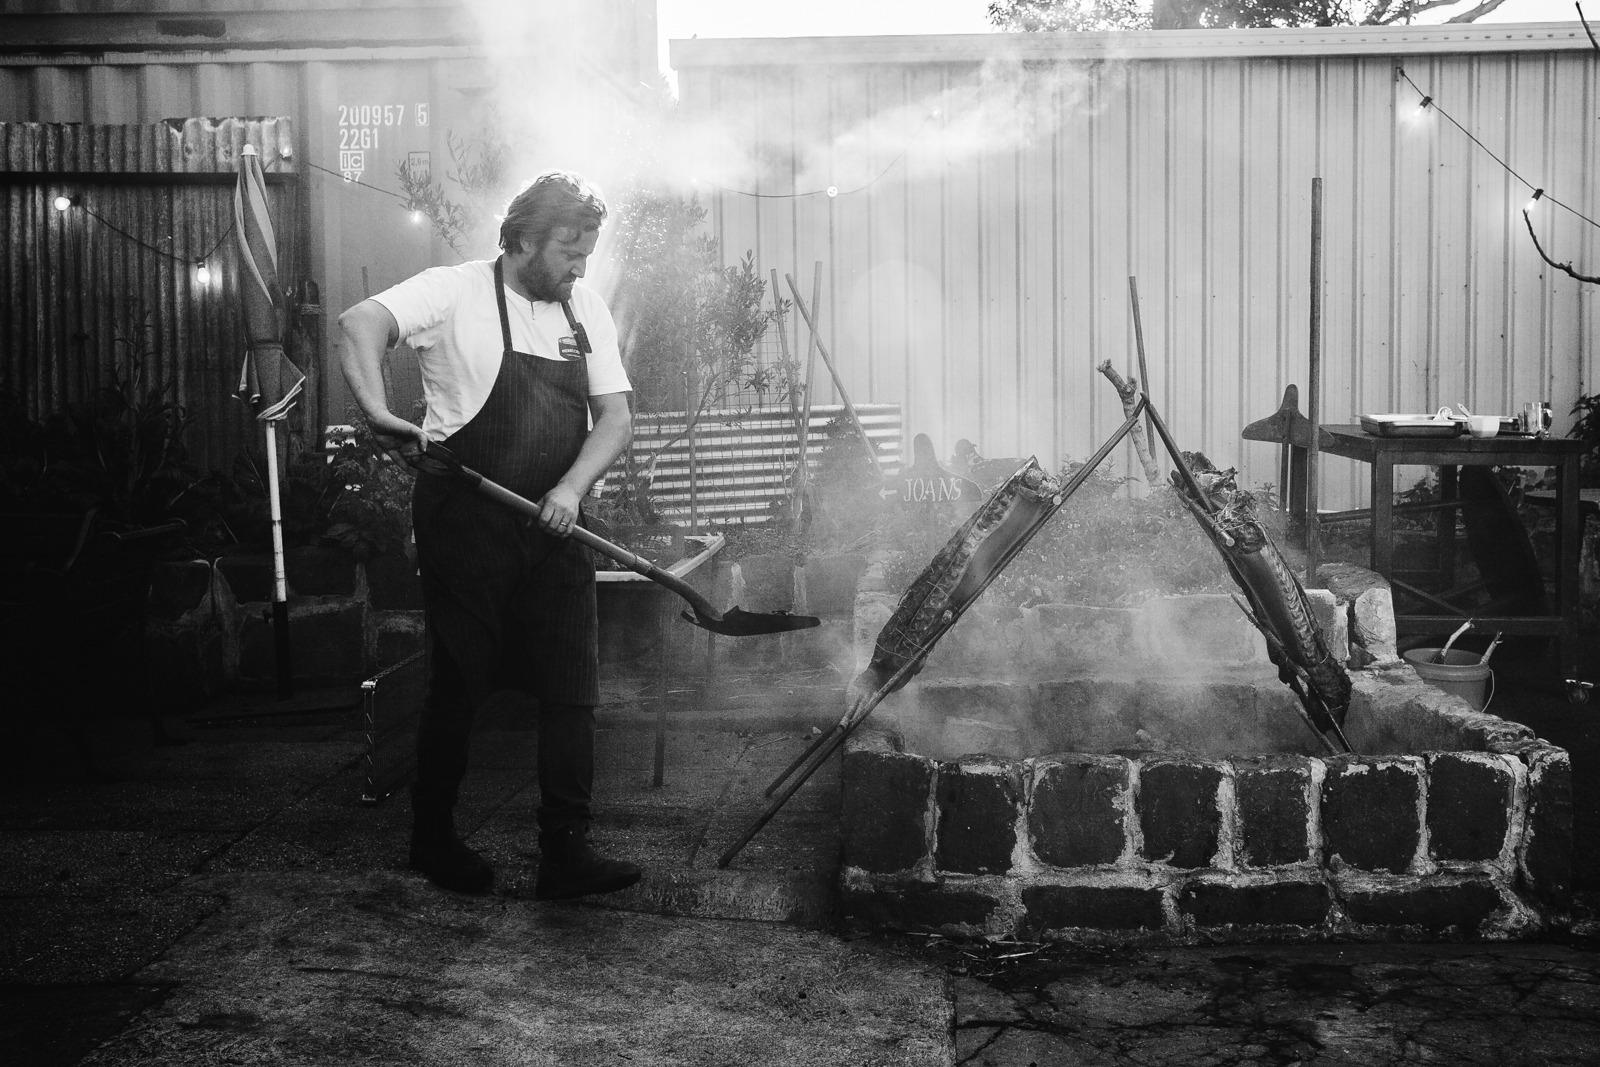 Matt Wilkinson at Noosa Food Festival – Peppermint magazine